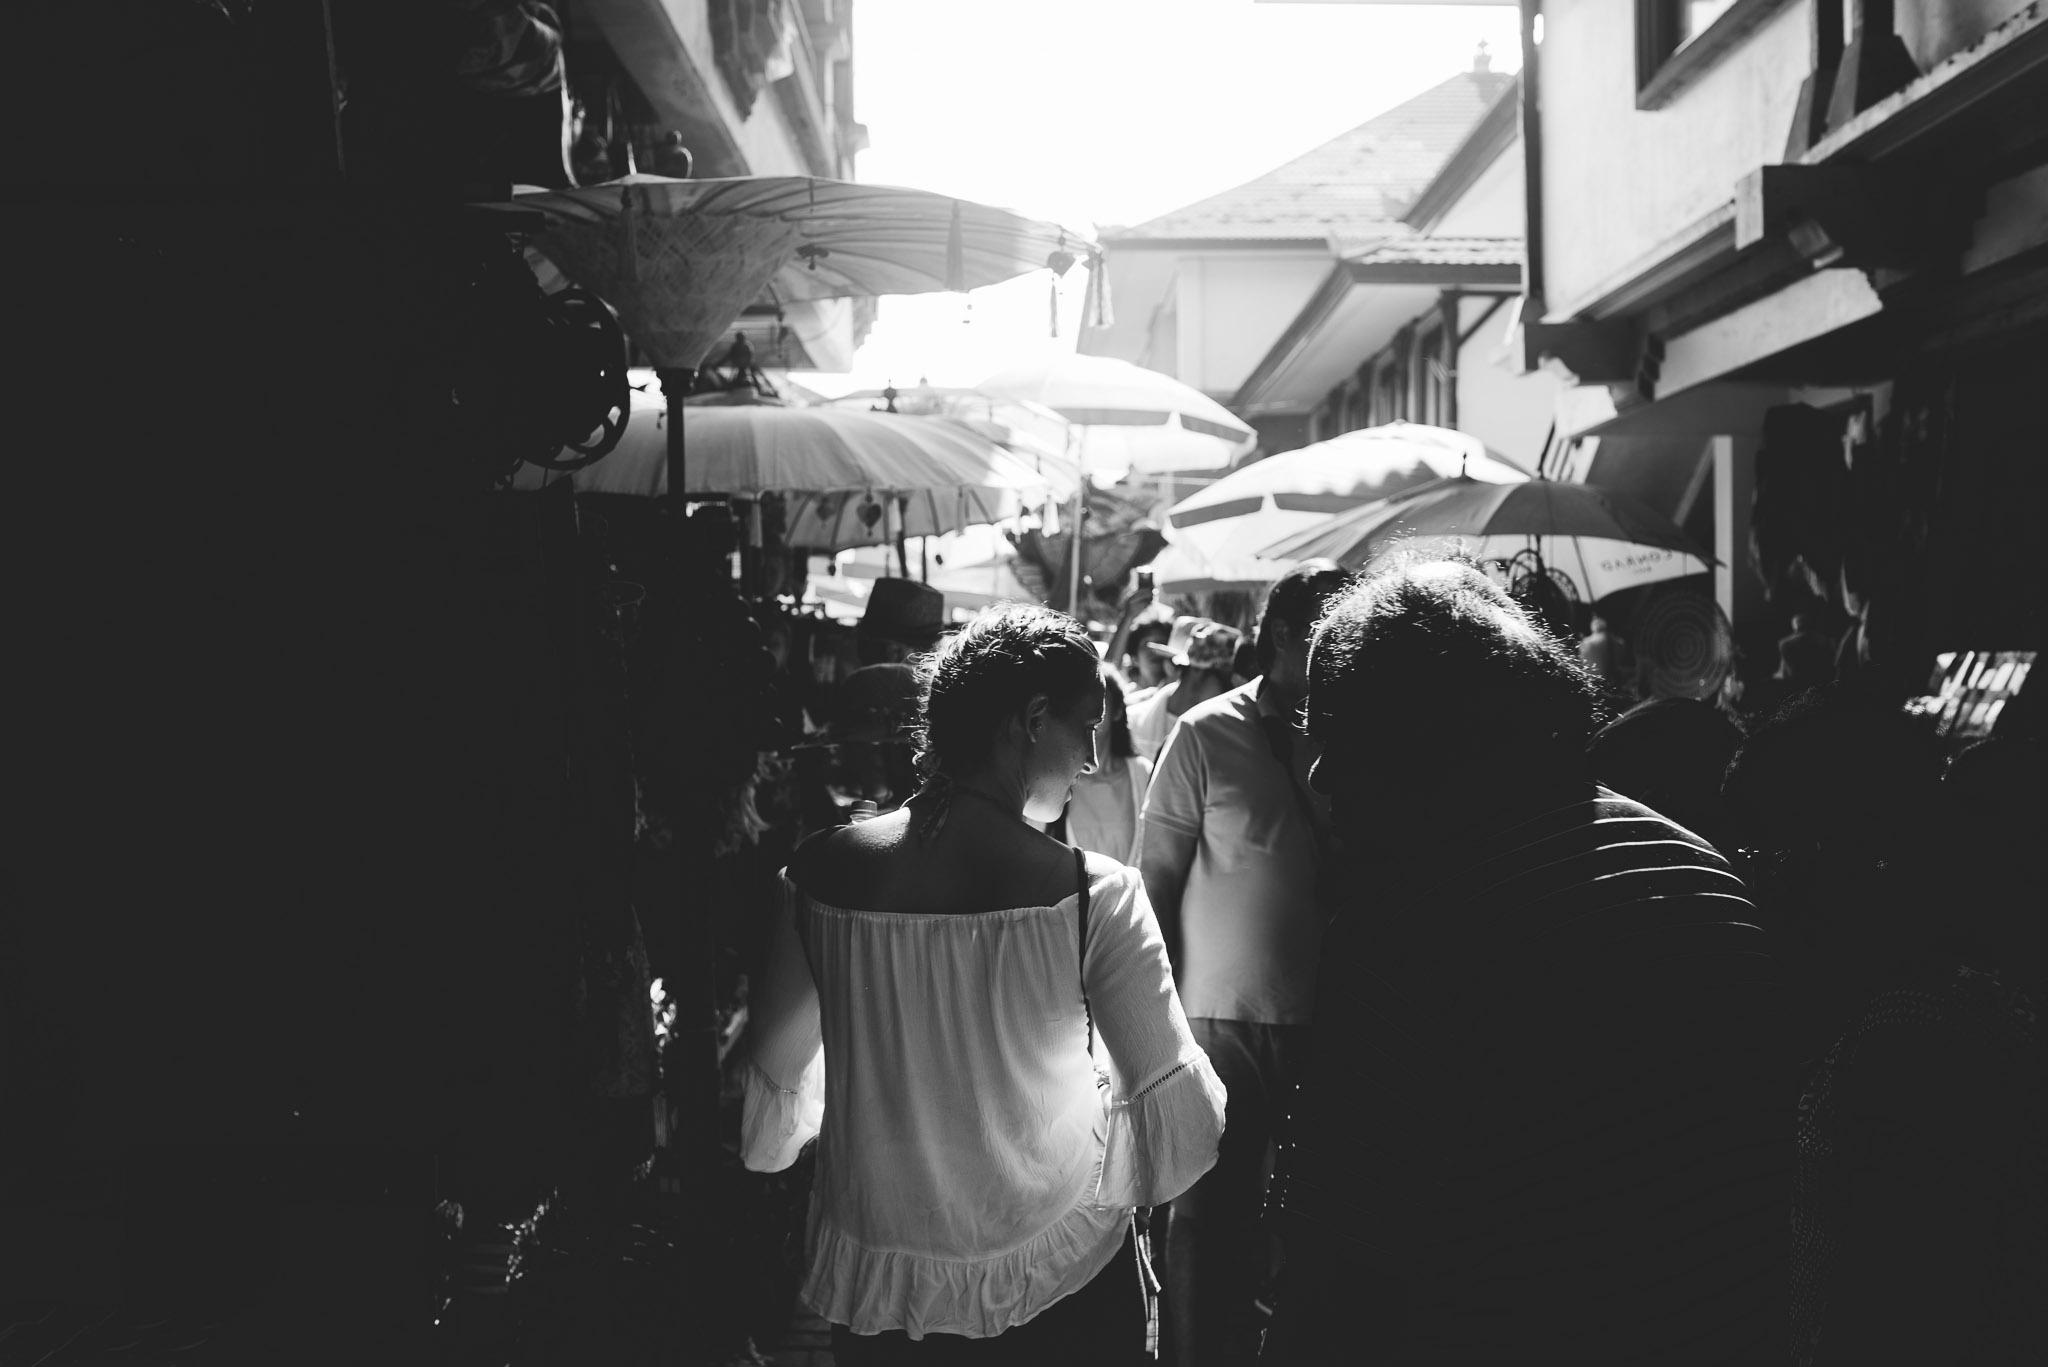 ubud art markets V